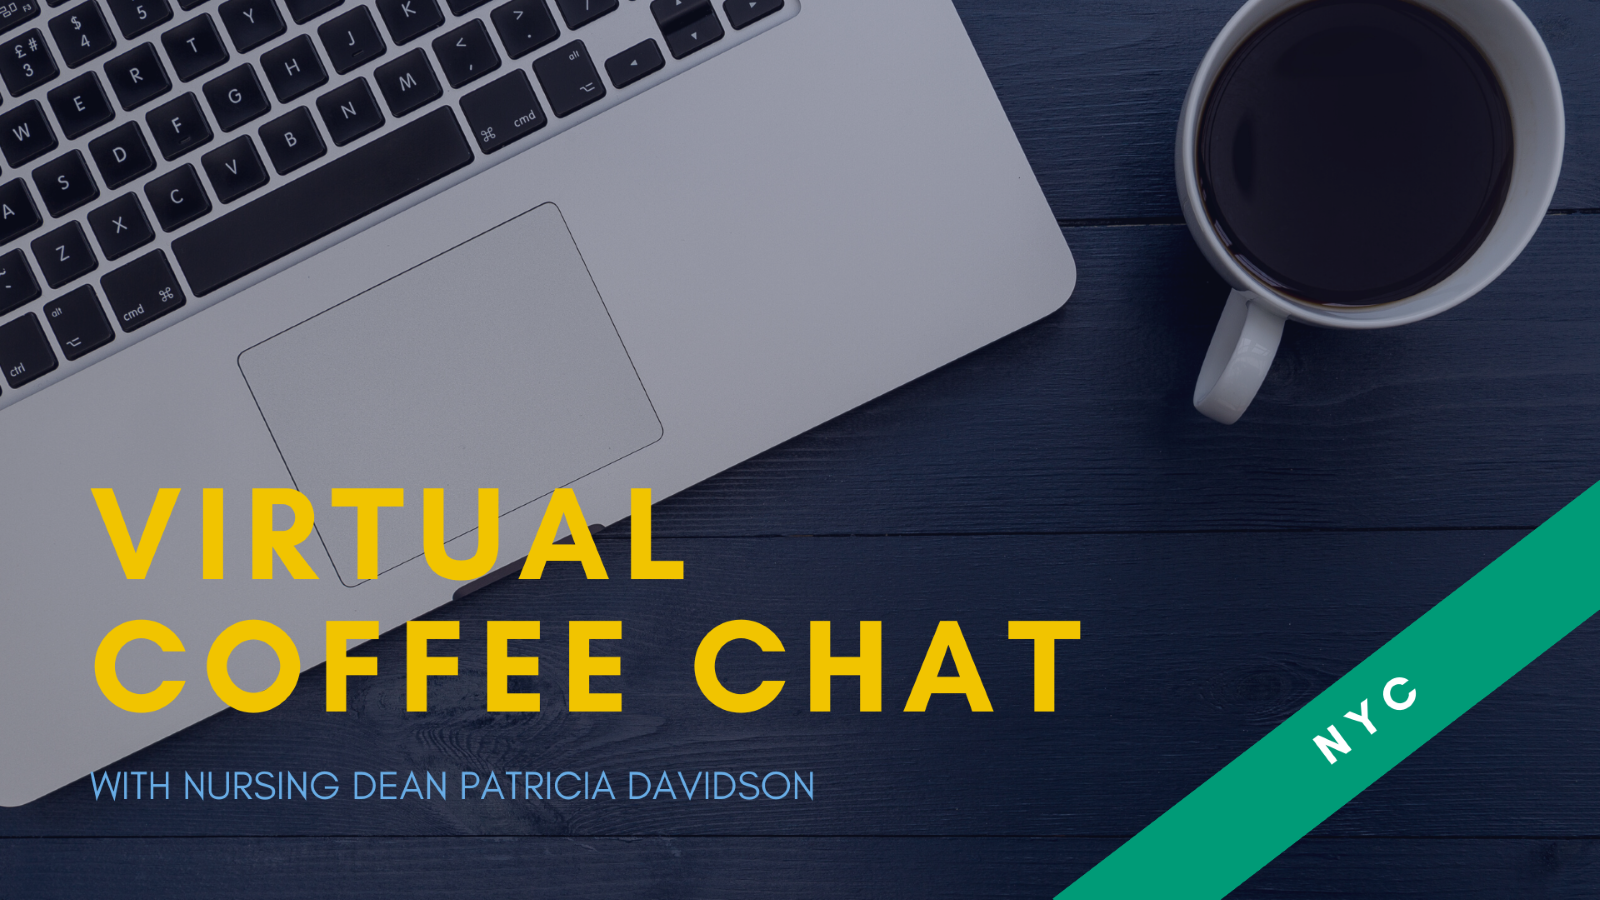 Virtual Coffee Chat with Nursing Dean Davidson - NYC header image